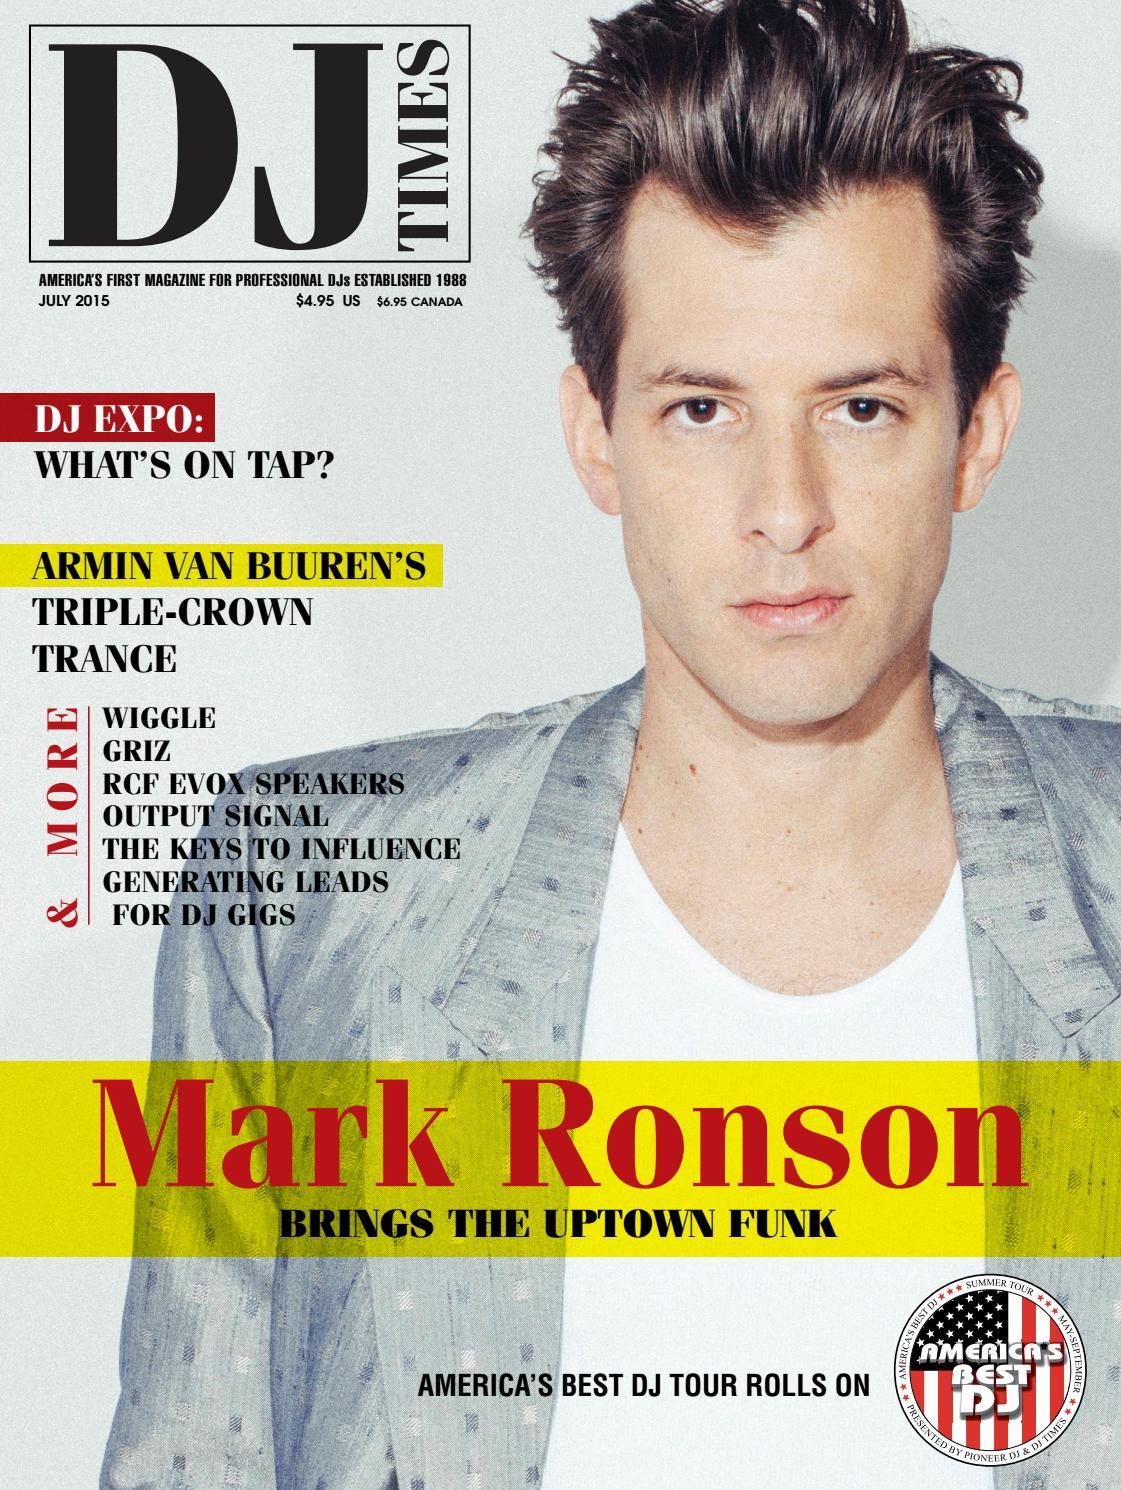 DJ Times July 2015, Vol 28 No 7 by DJ Times Magazine - issuu